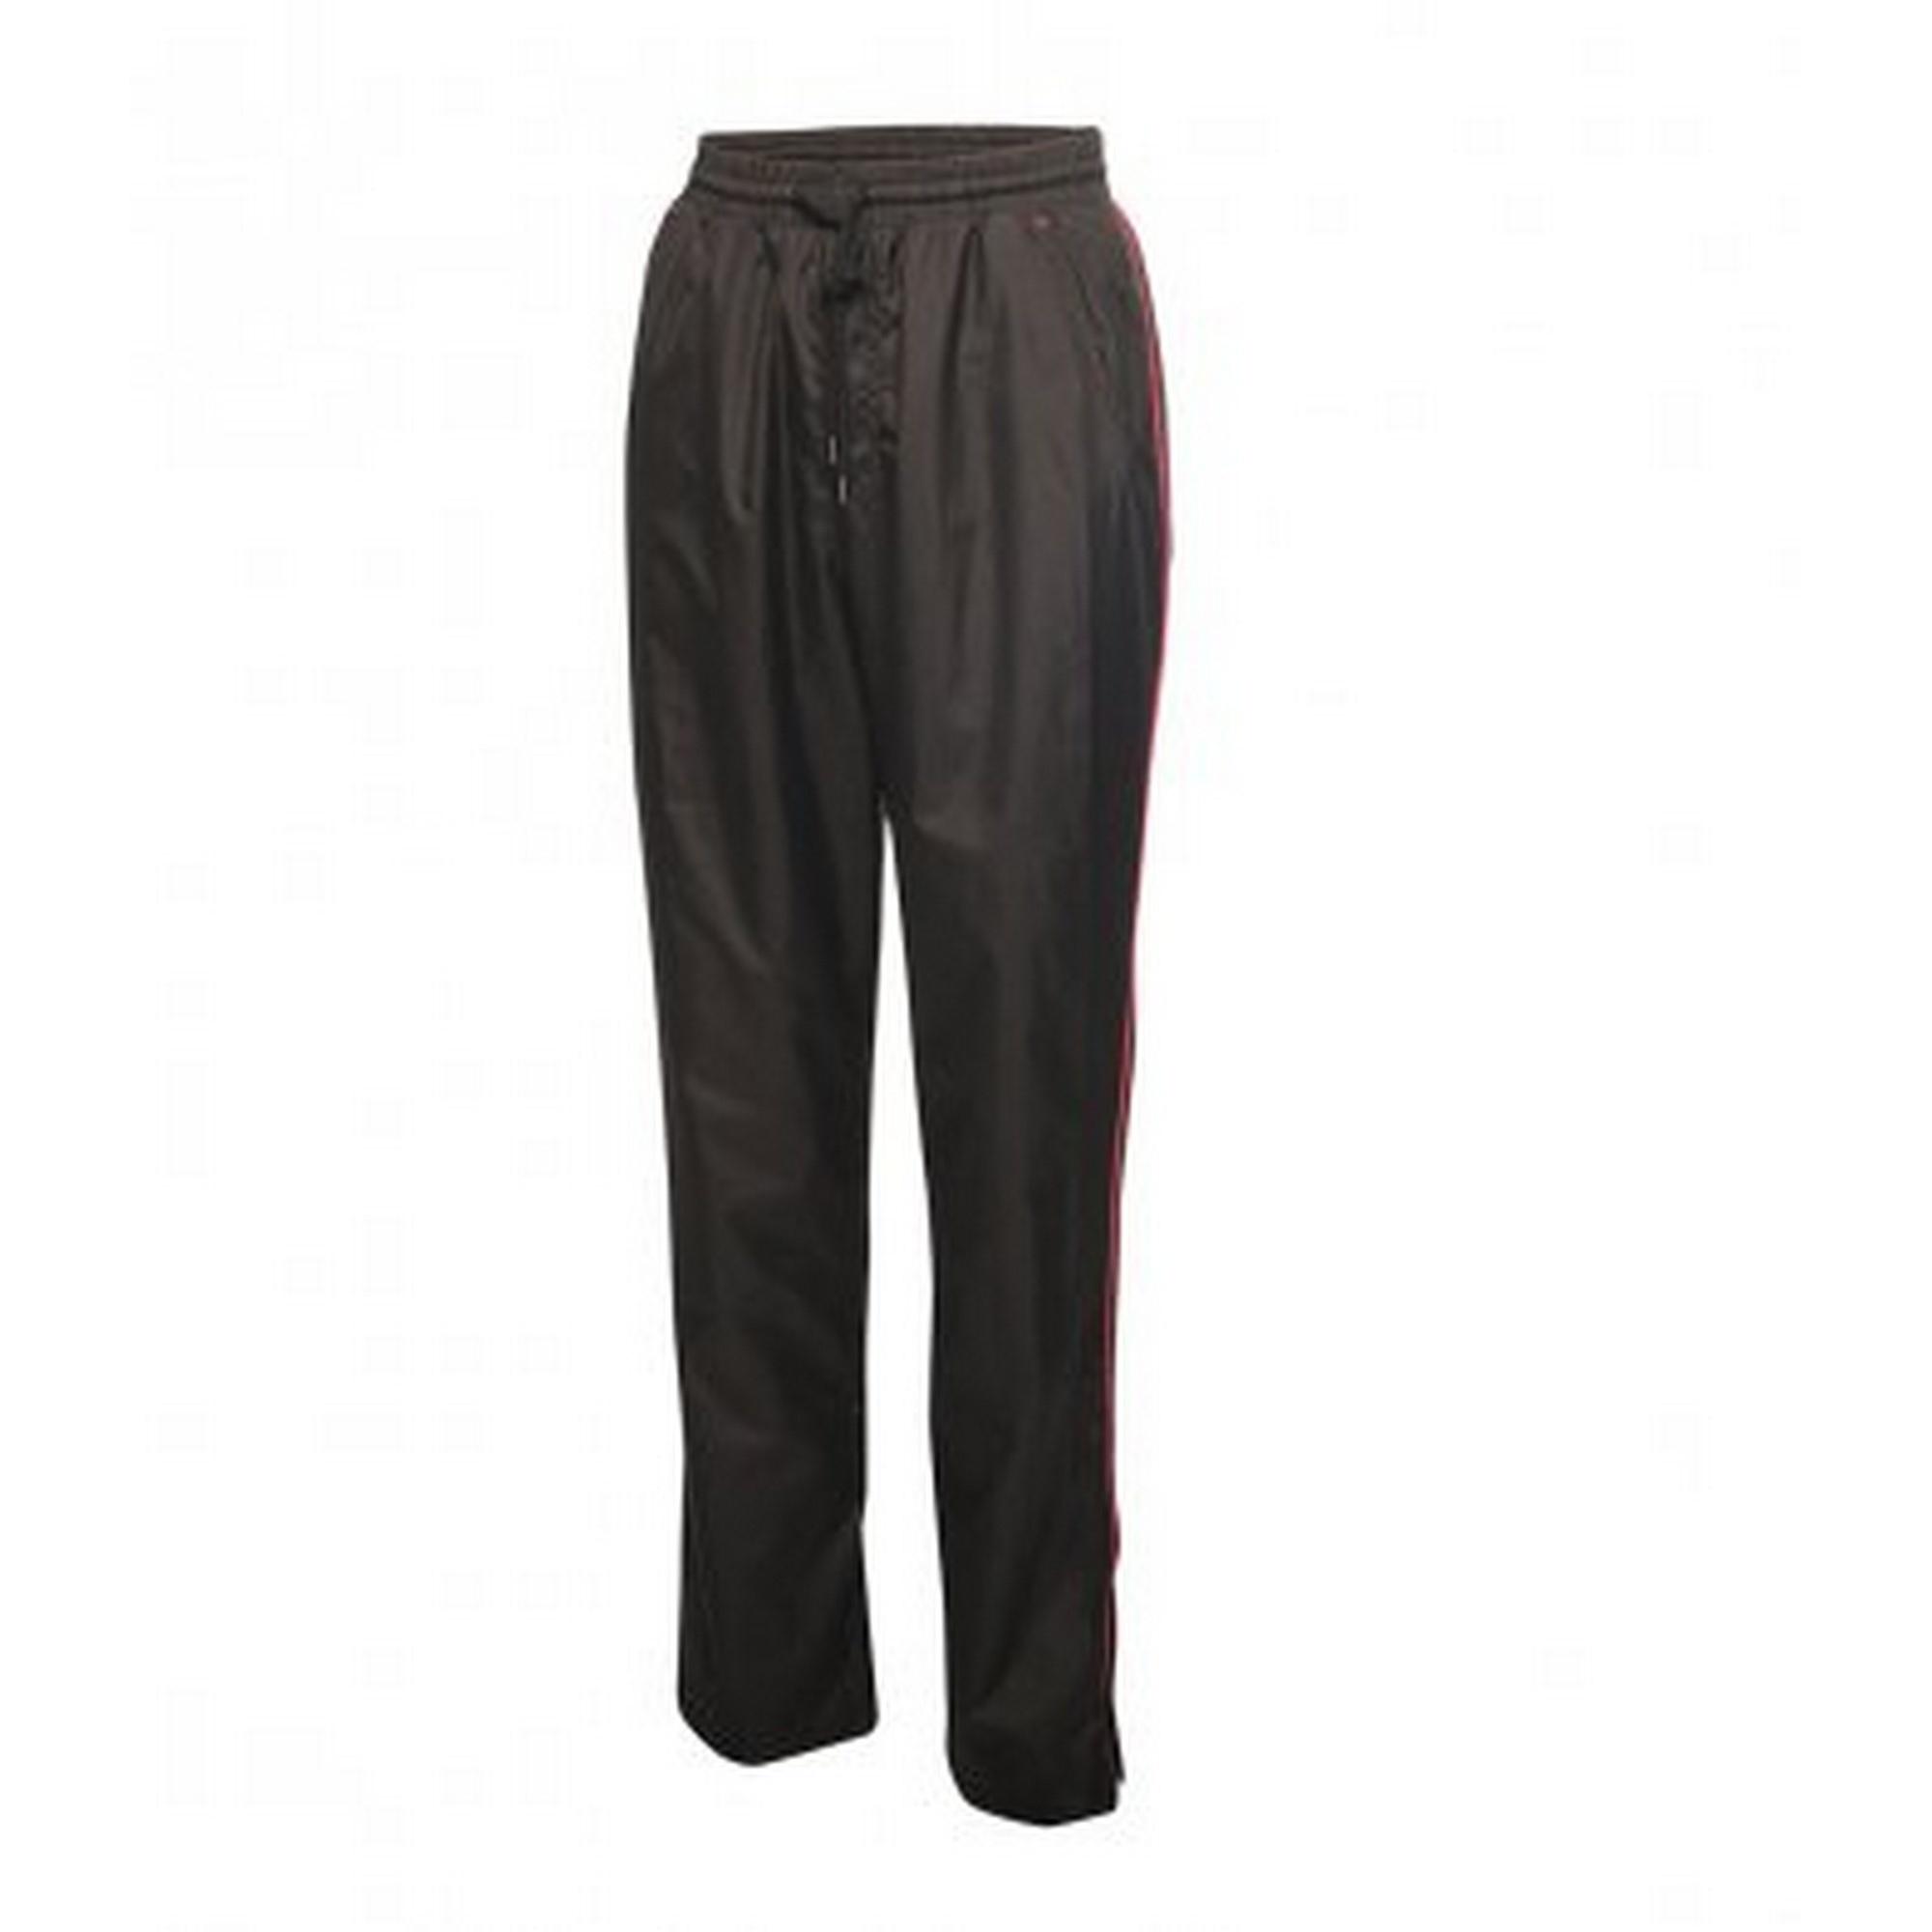 Regatta-Activewear-Womens-Ladies-Athens-Contrast-Tracksuit-Pants-PC3122